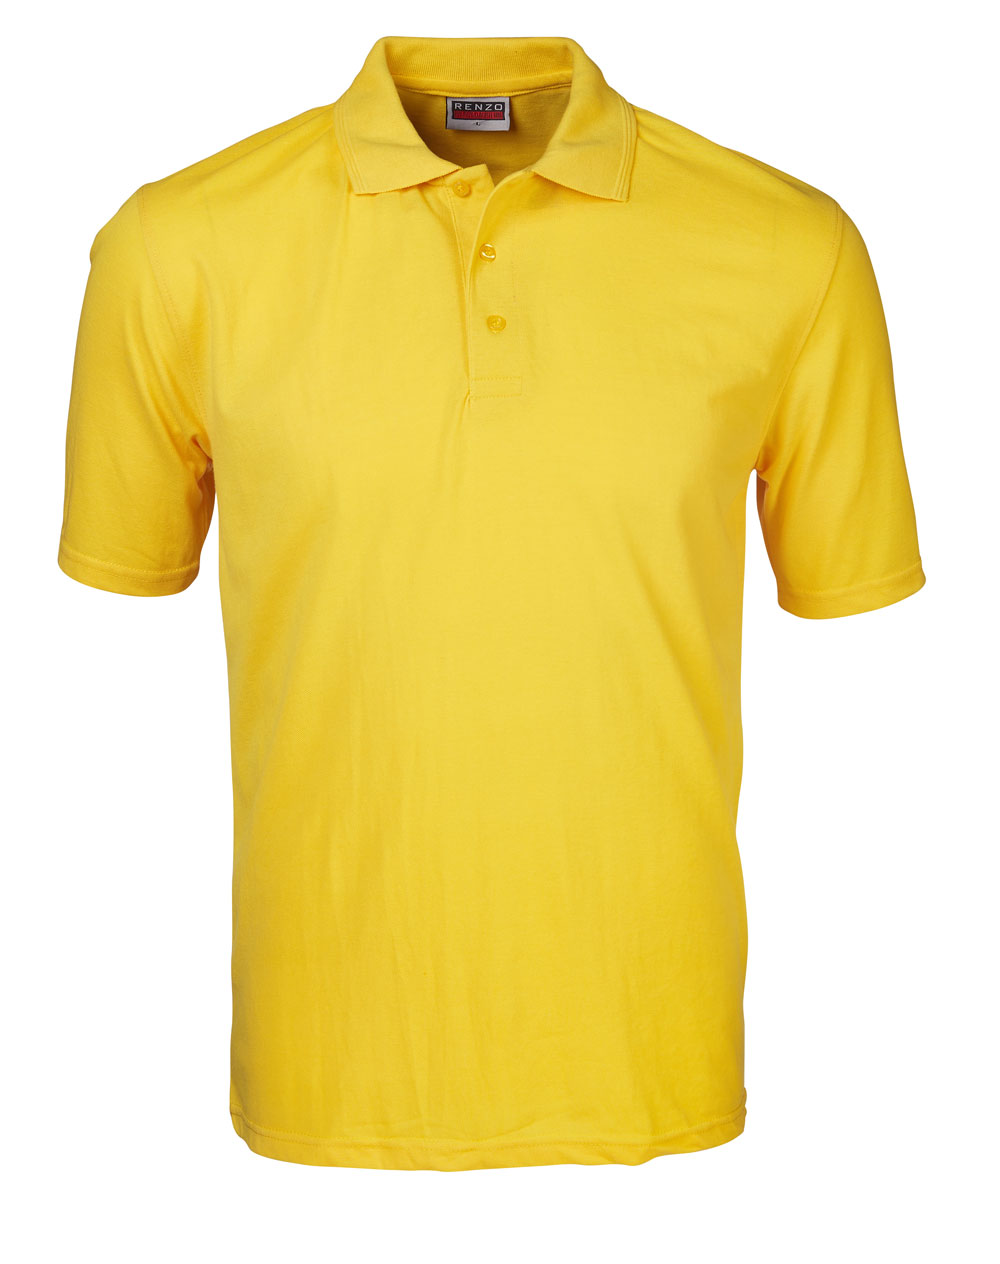 P18 Pique Golfer - Yellow